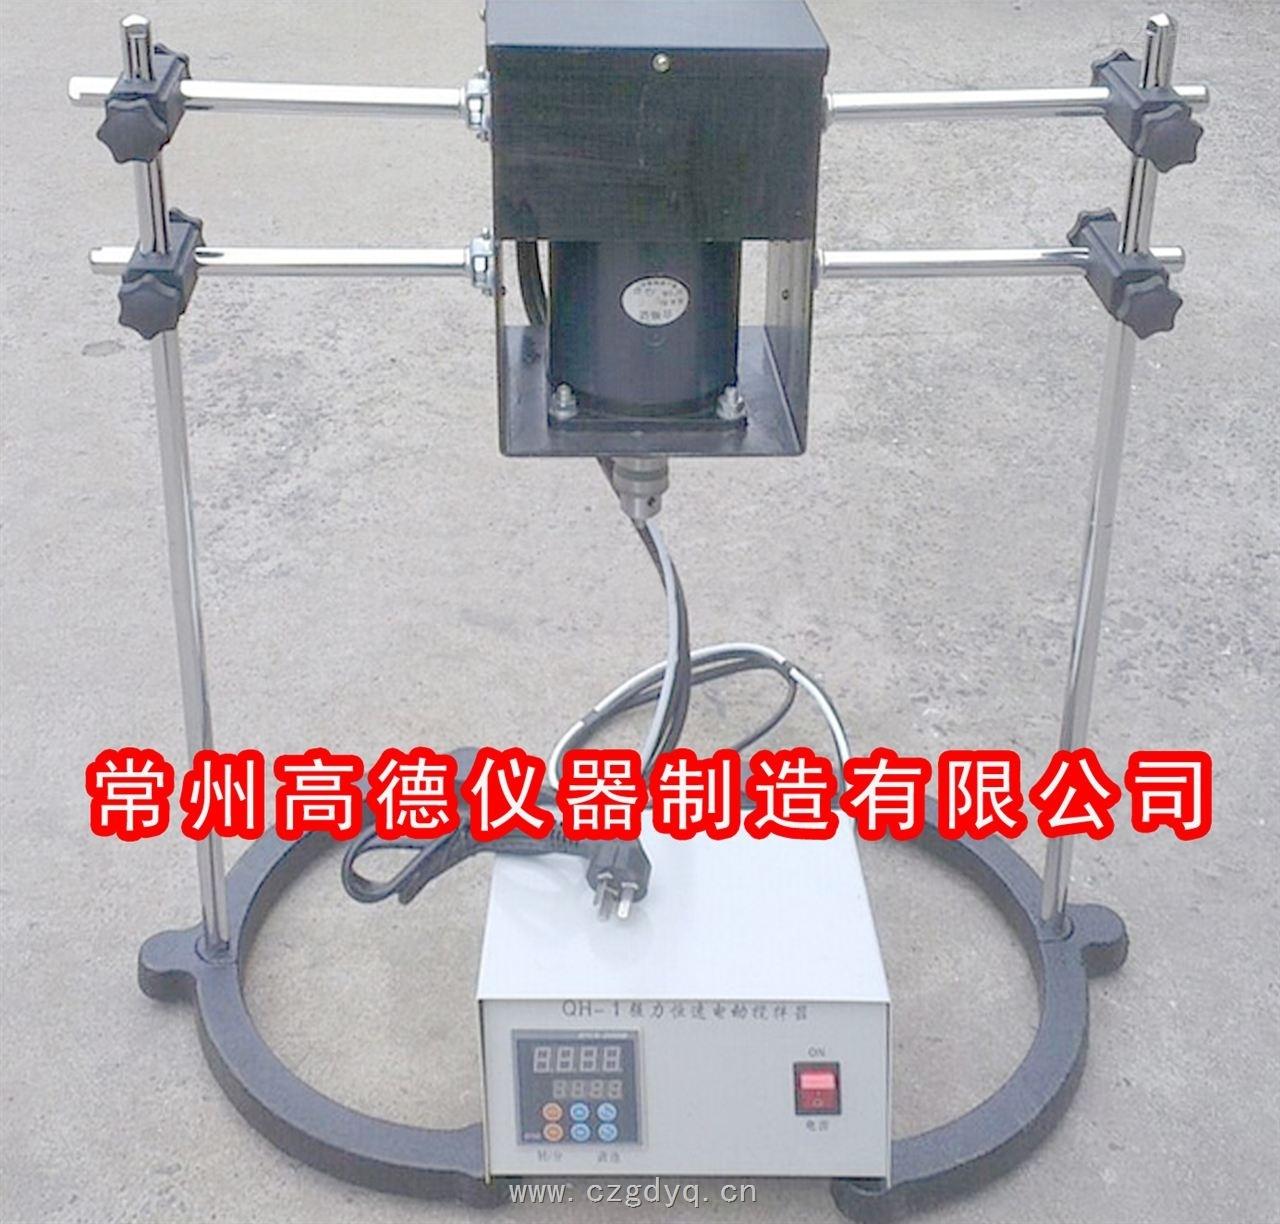 QH-1-恒速强力电动搅拌器